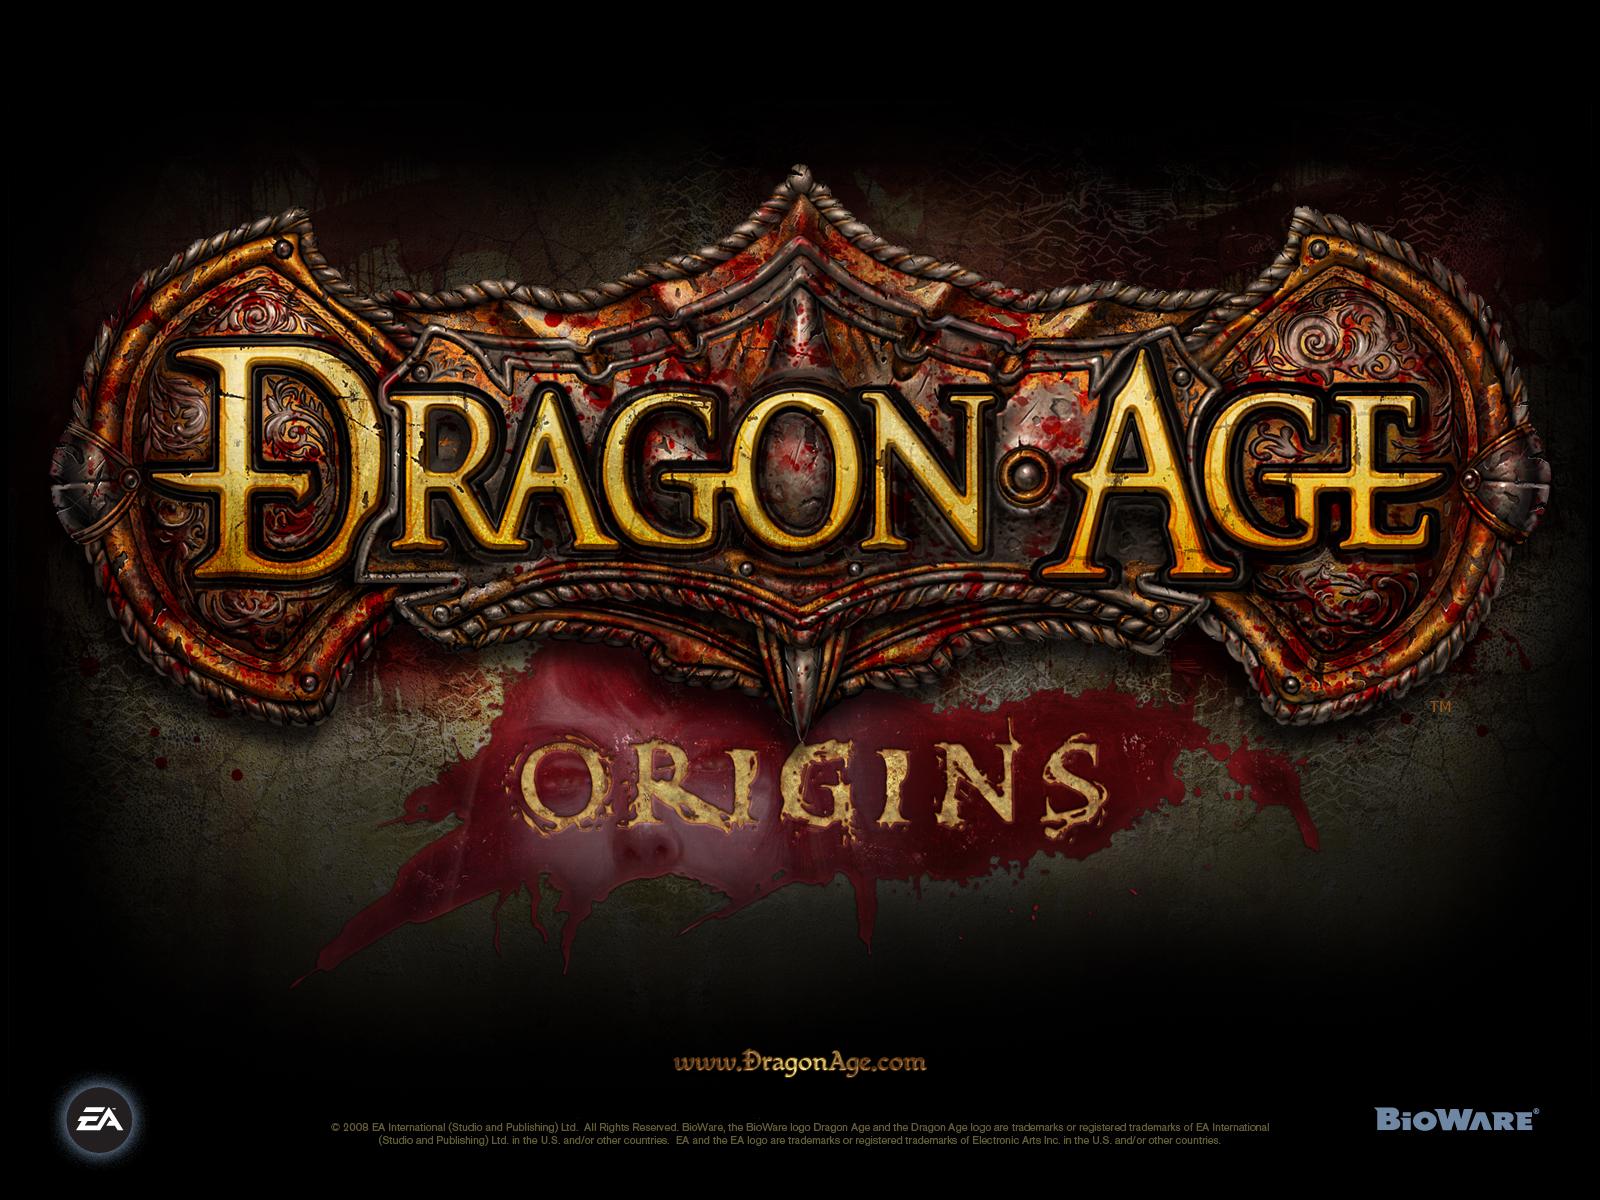 Dragon Age Origins, РПГ от известного гиганта игростроя BioWare, в